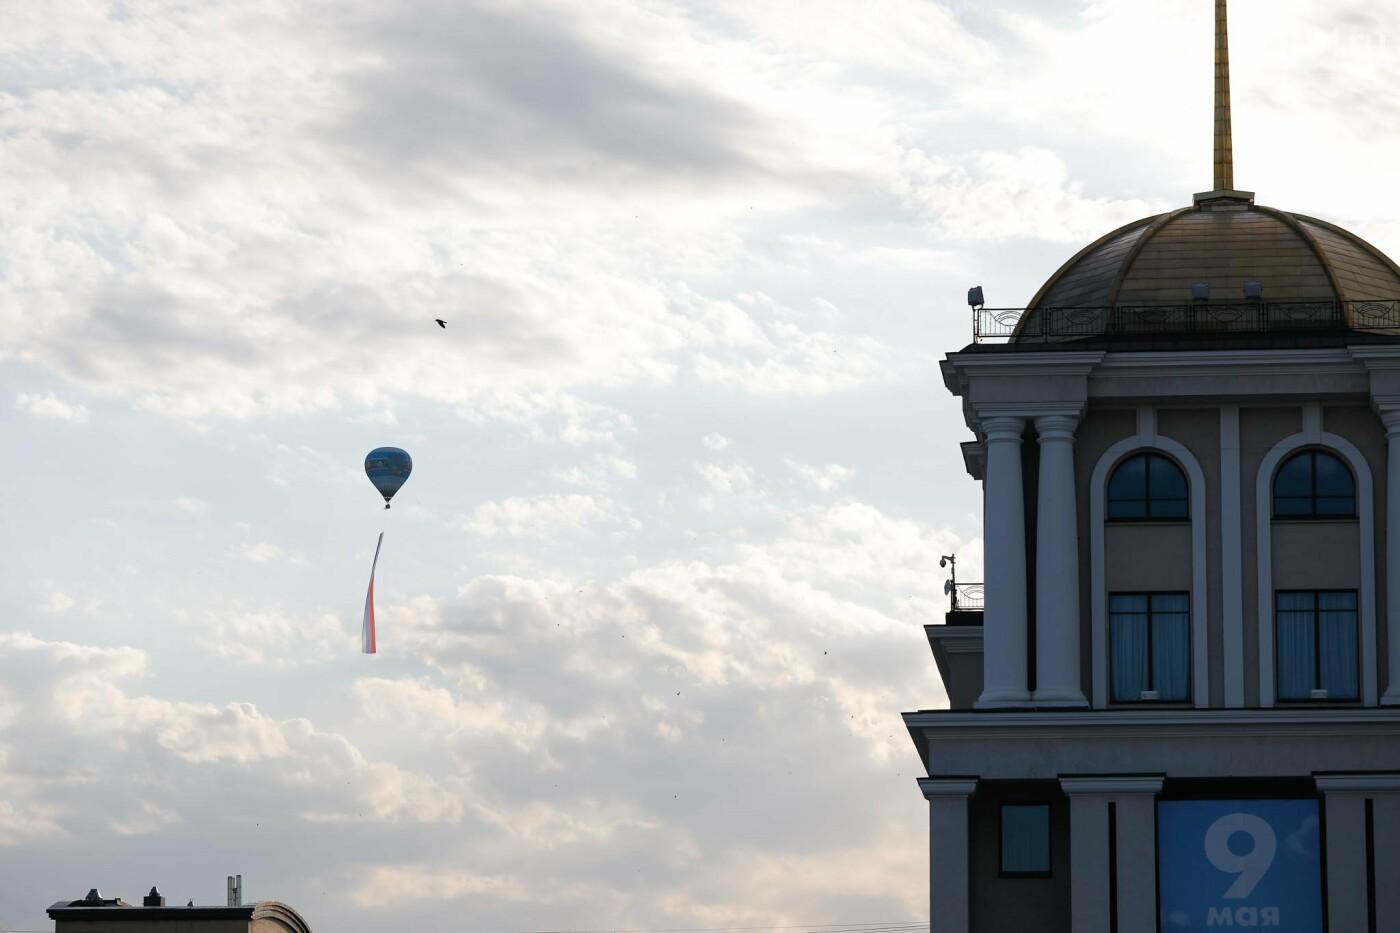 Над Белгородом пролетел аэростат с гигантским триколором, фото-26, Фото: Антон Вергун